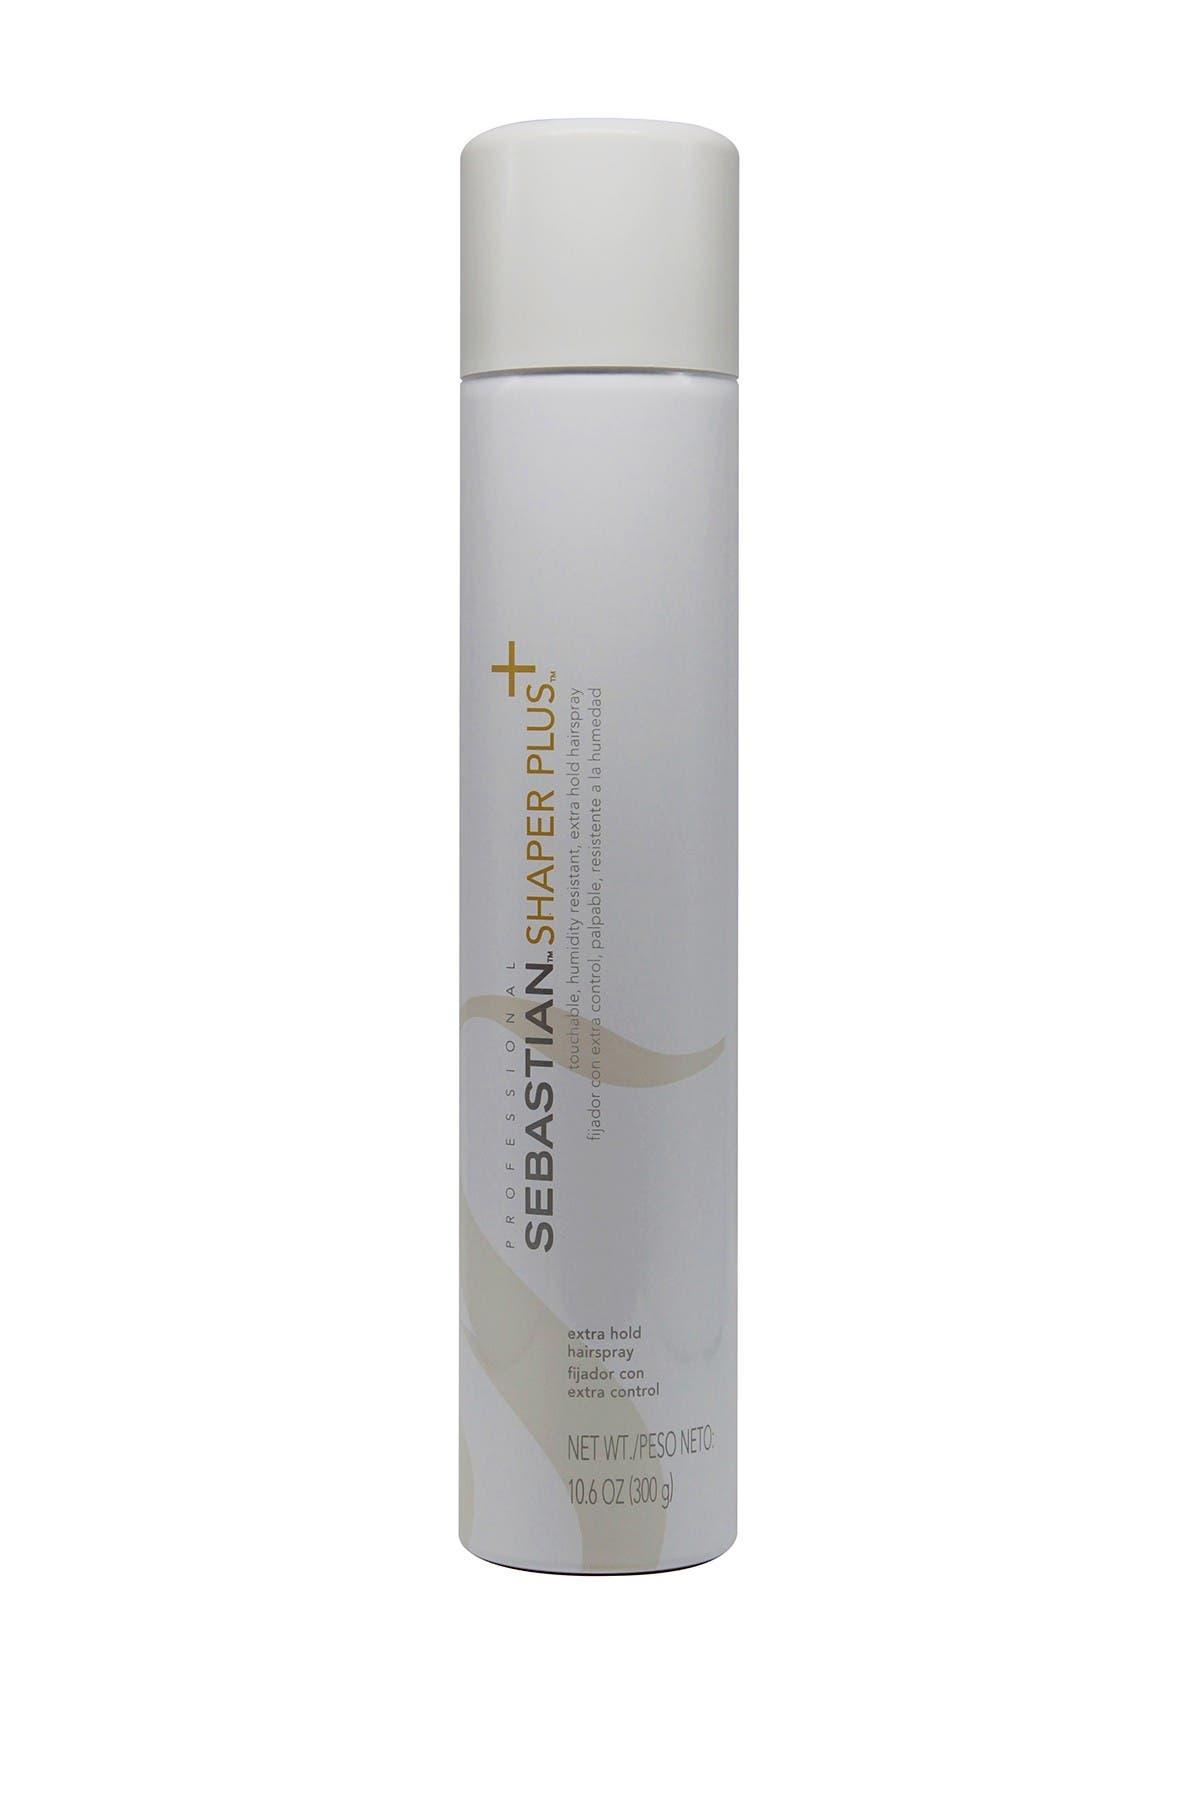 Image of SEBASTIAN Shaper Plus Hairspray - 10.6 oz.